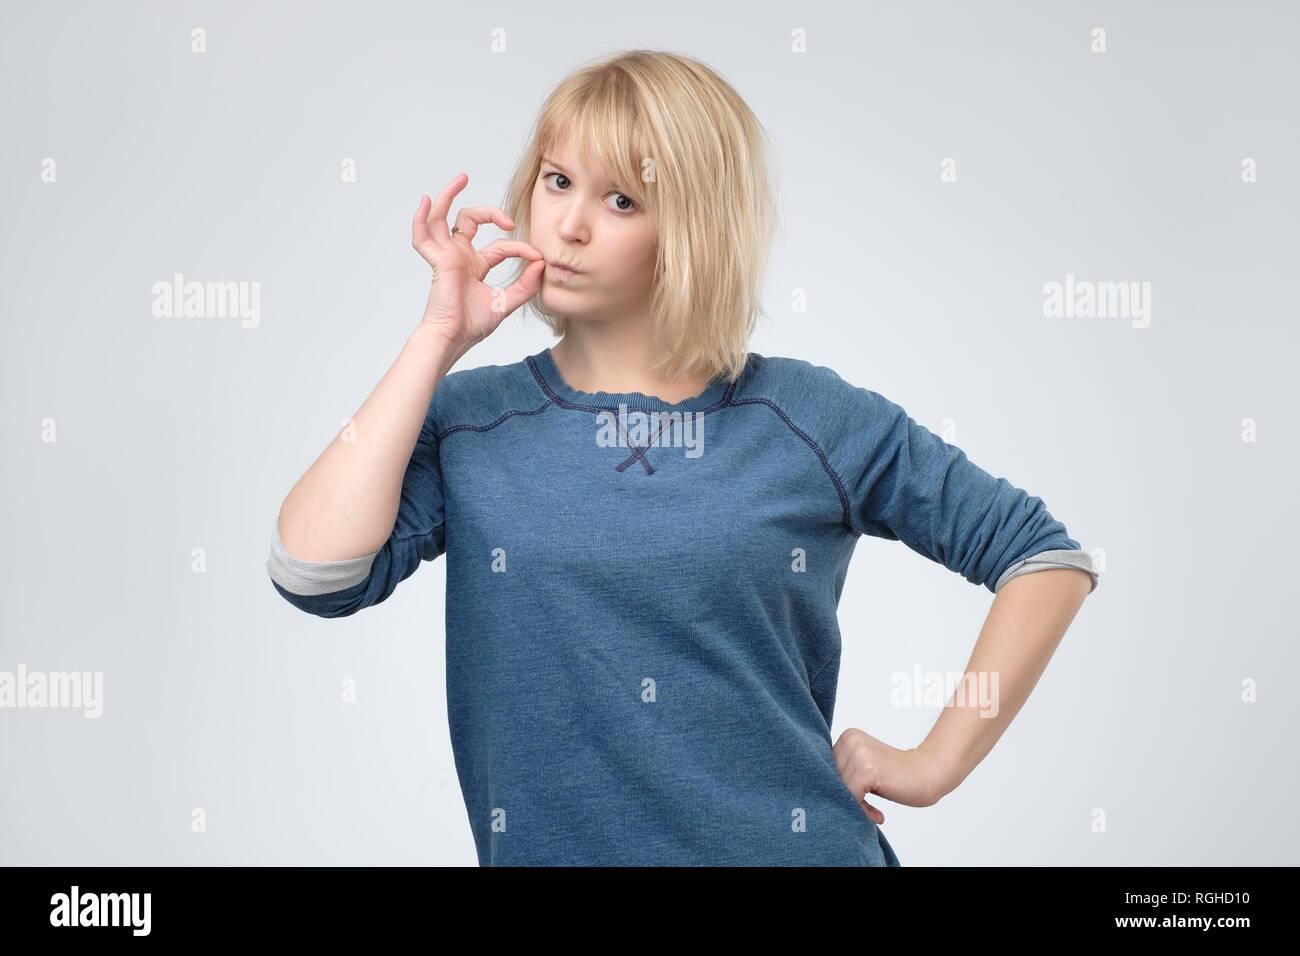 Keep a secret, woman zipping her mouth shut. - Stock Image